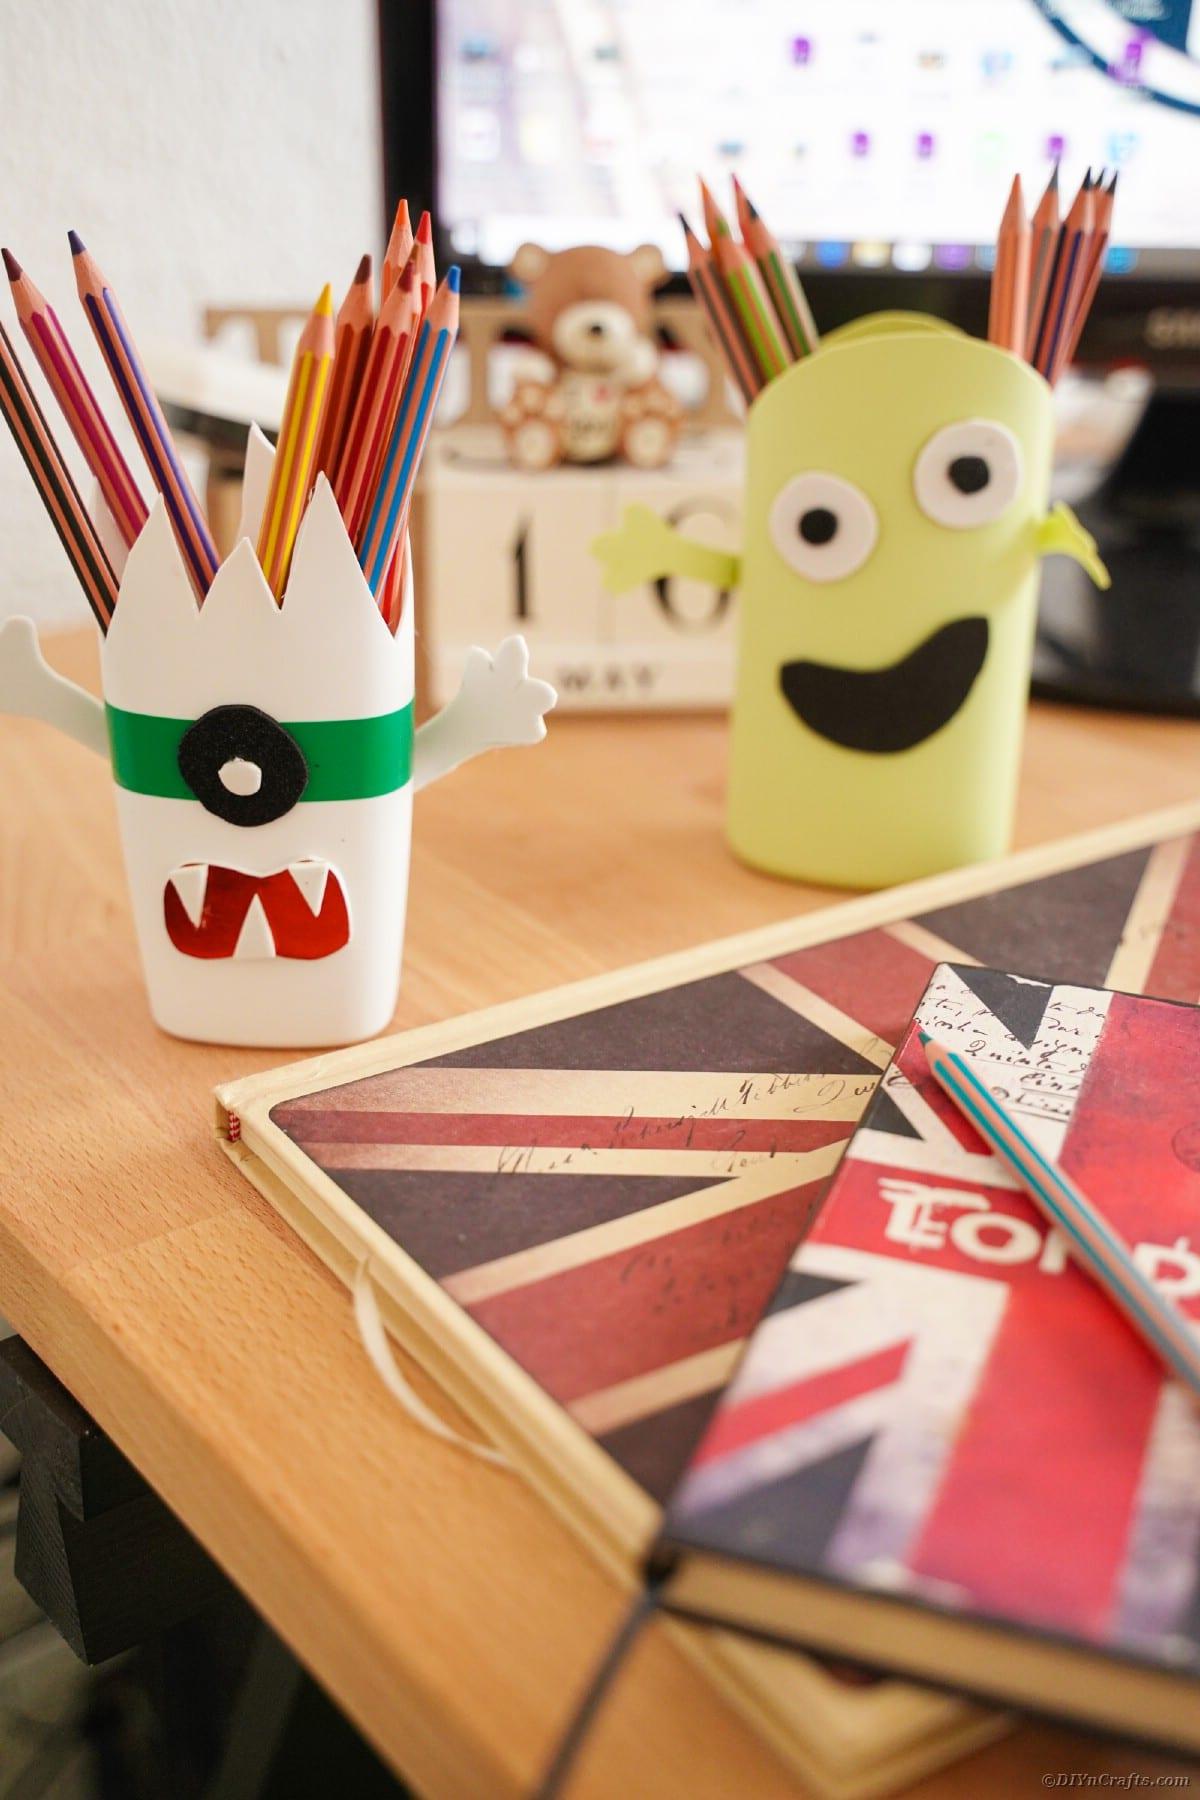 Pencil holders on desk